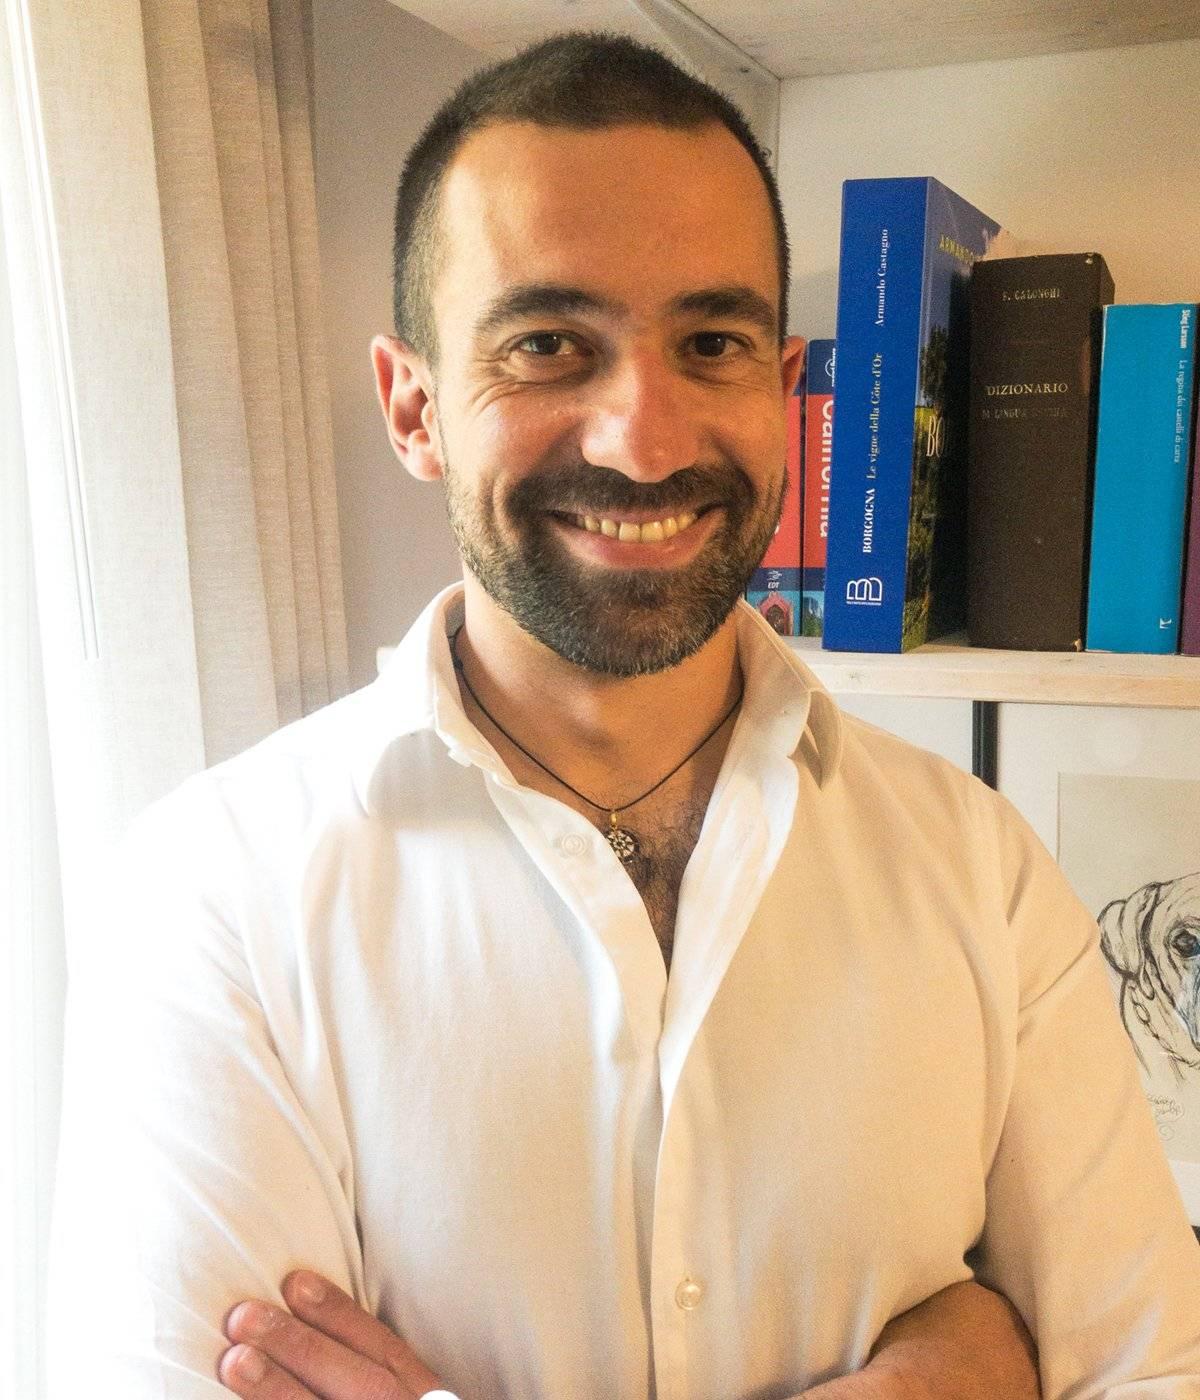 Riccardo Caliari 620Passi startup-news